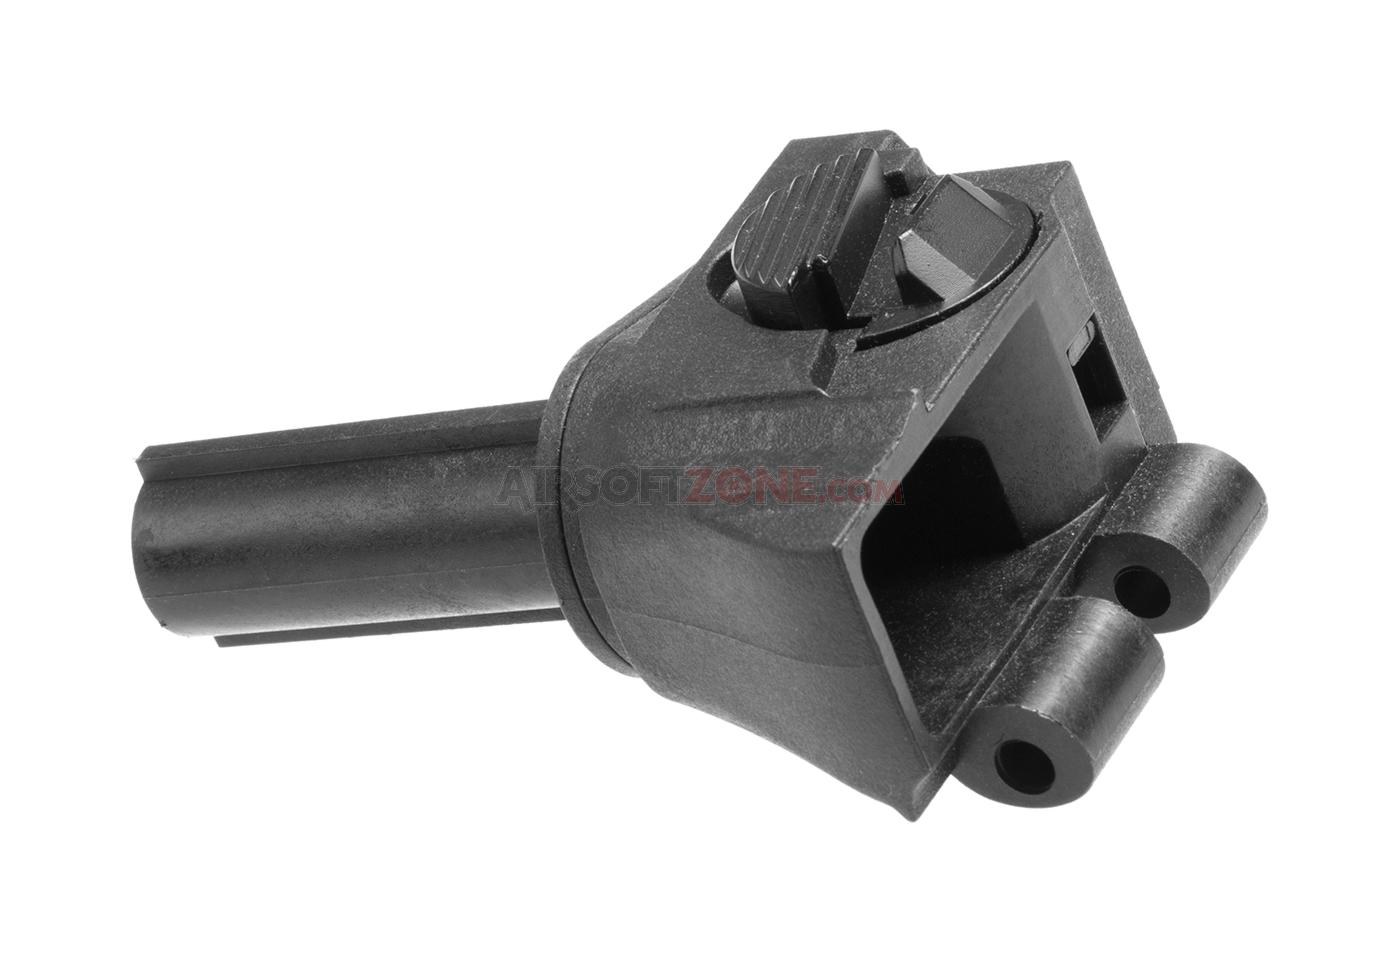 G36 Stock Adapter